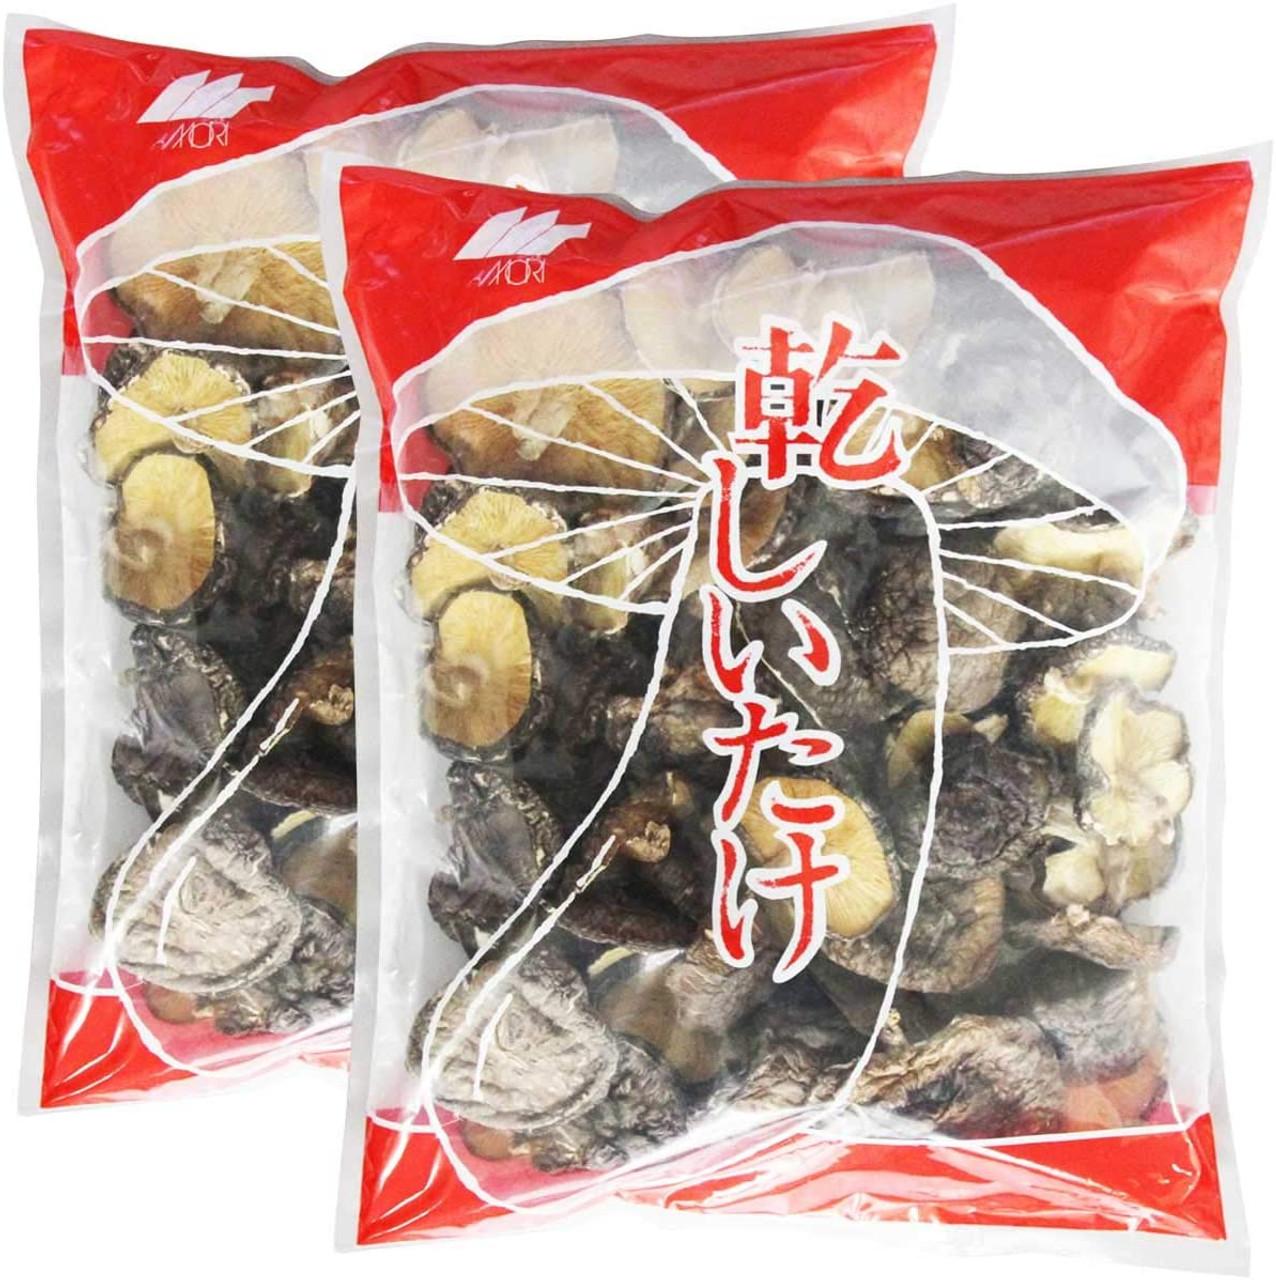 Miyazaki Prefecture Dried Shiitake Mushrooms